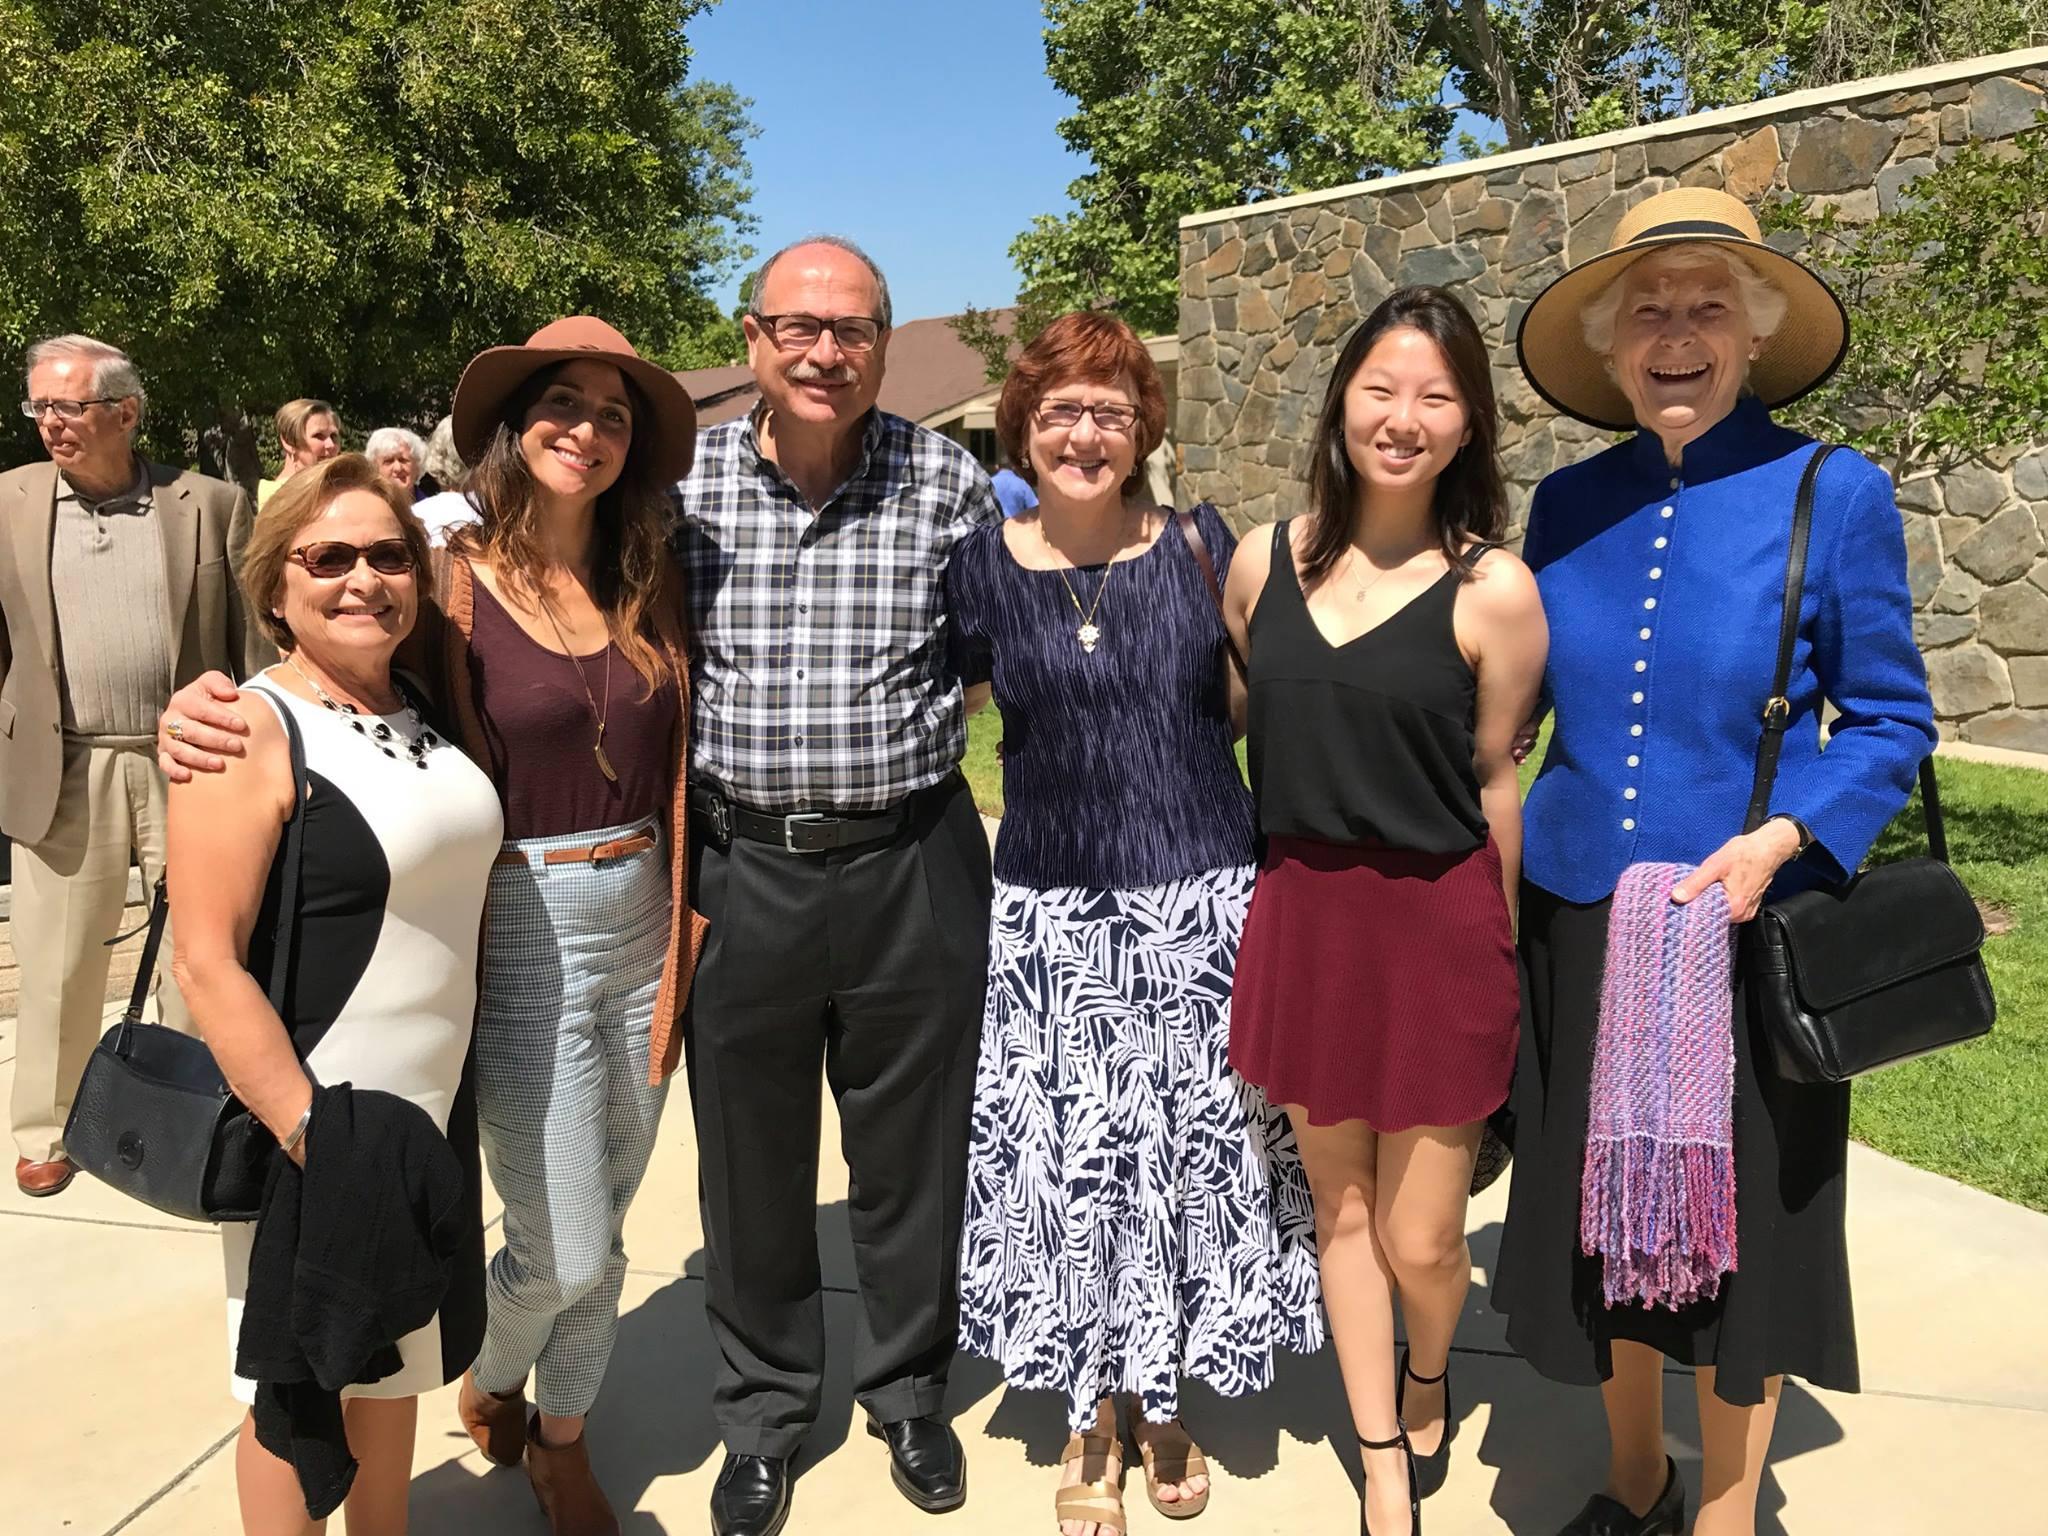 claremont-presbyterian-church-family-members.jpg